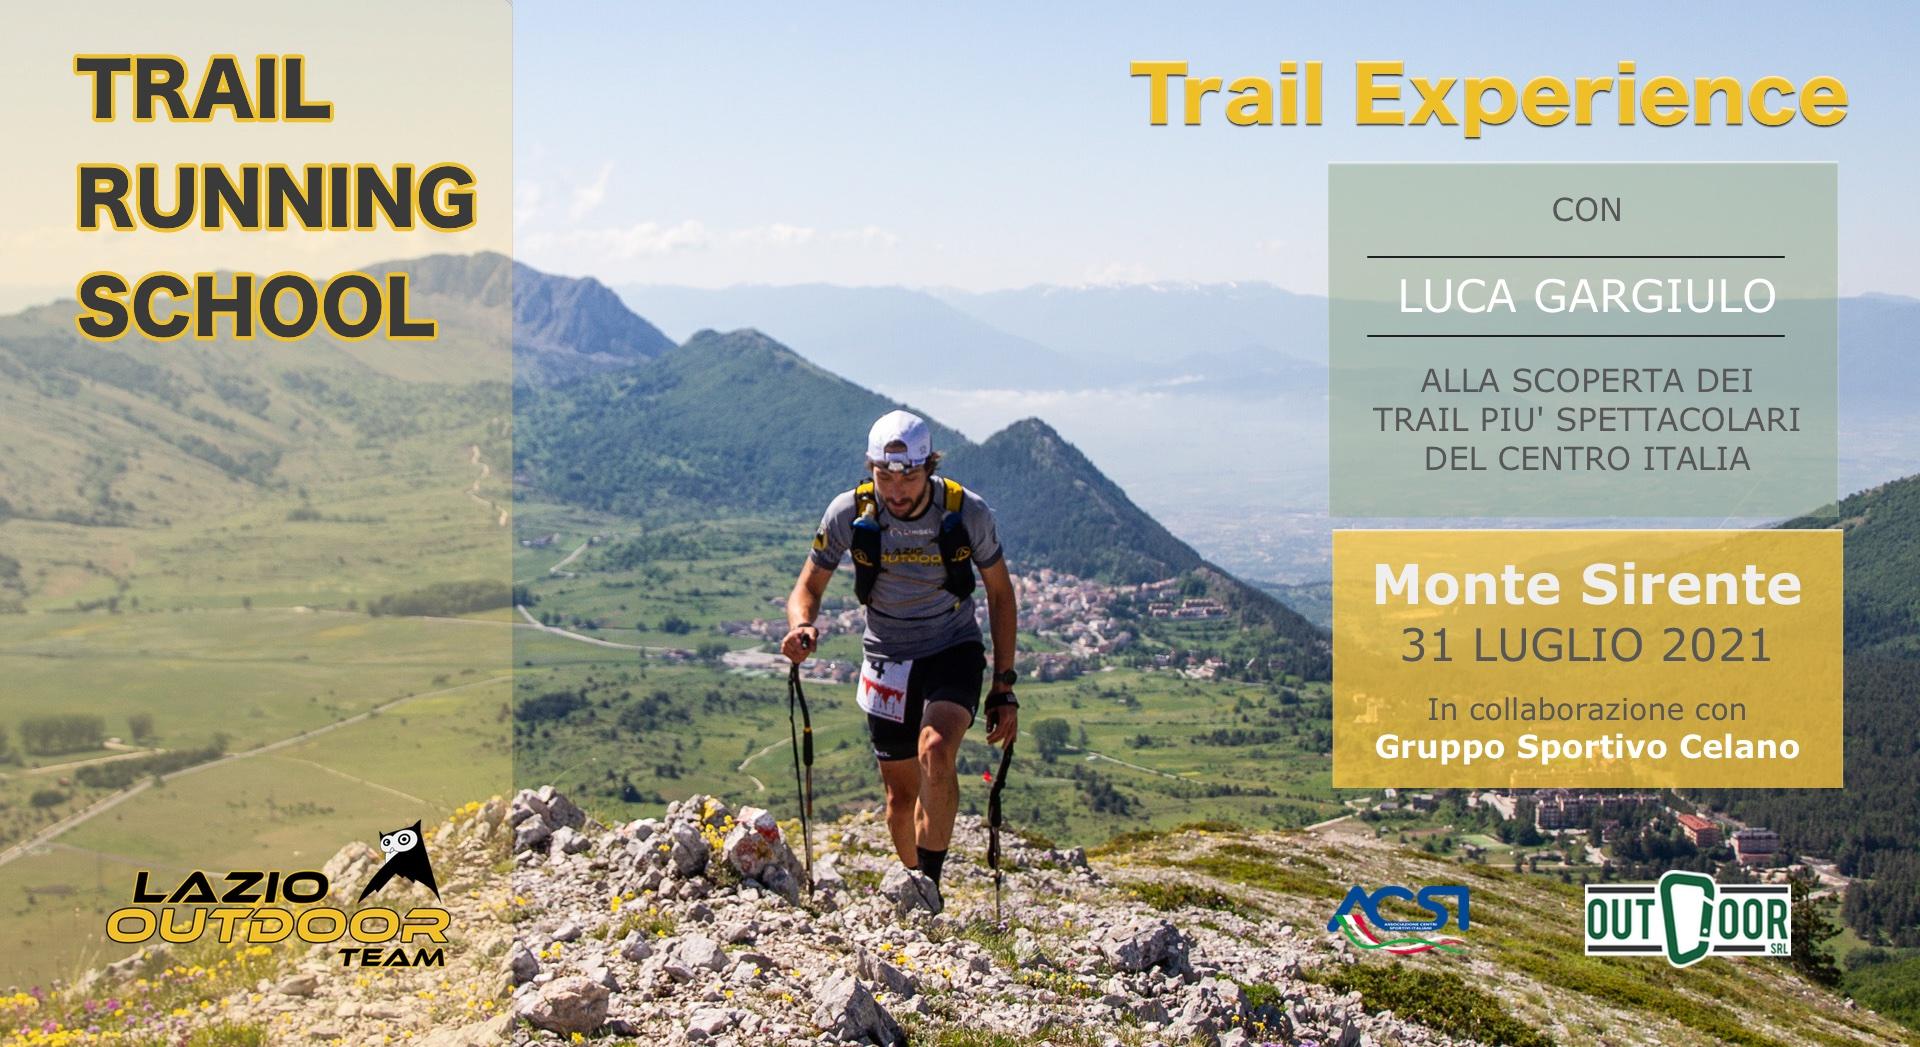 Trail Running School - Experience 1